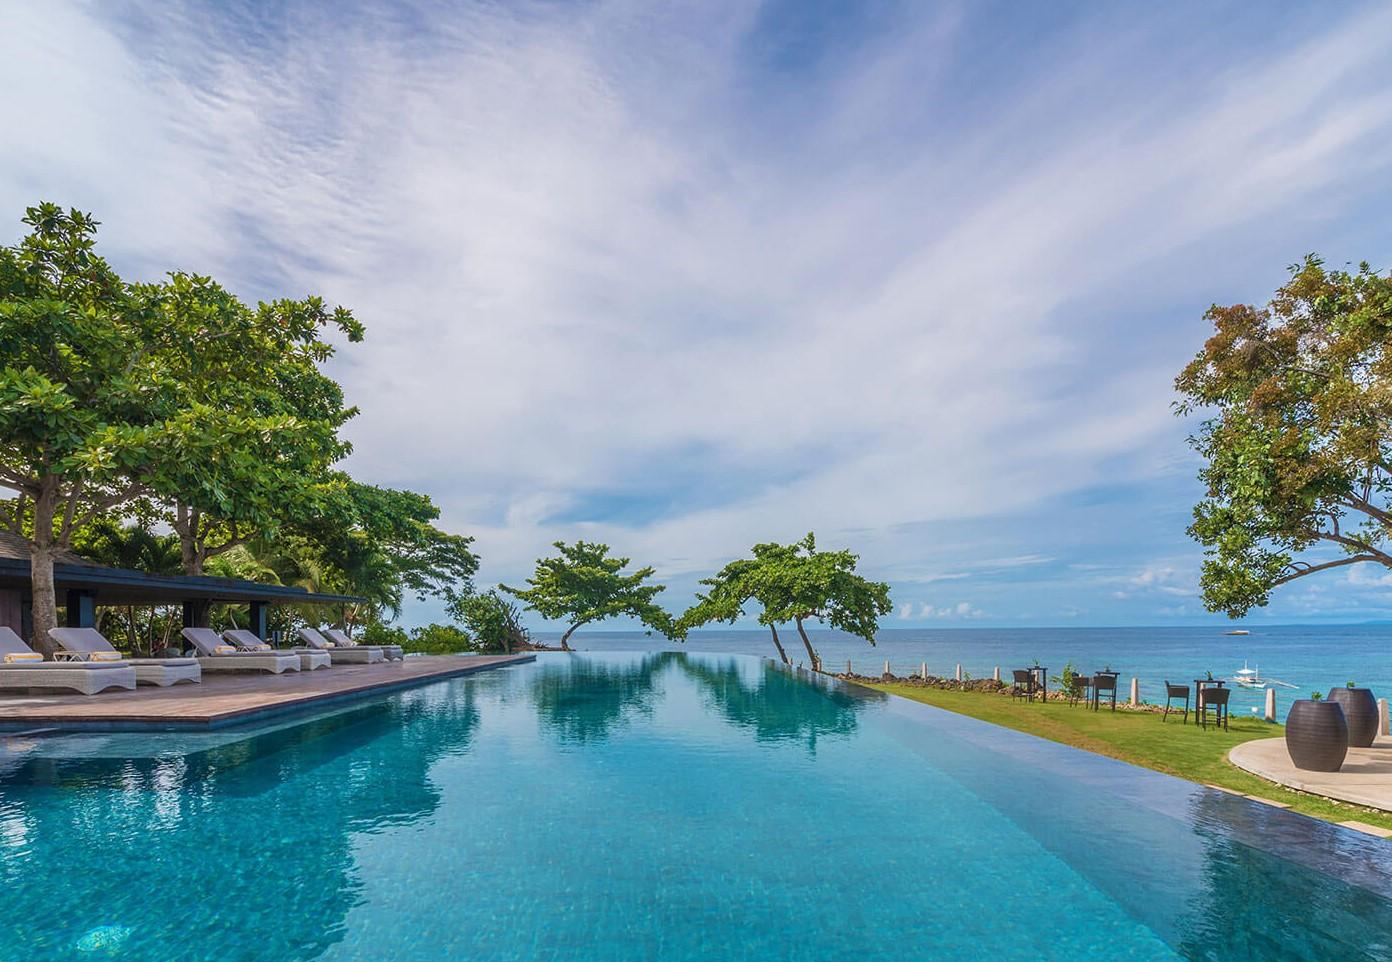 Clear waters of Amorita Resort pool